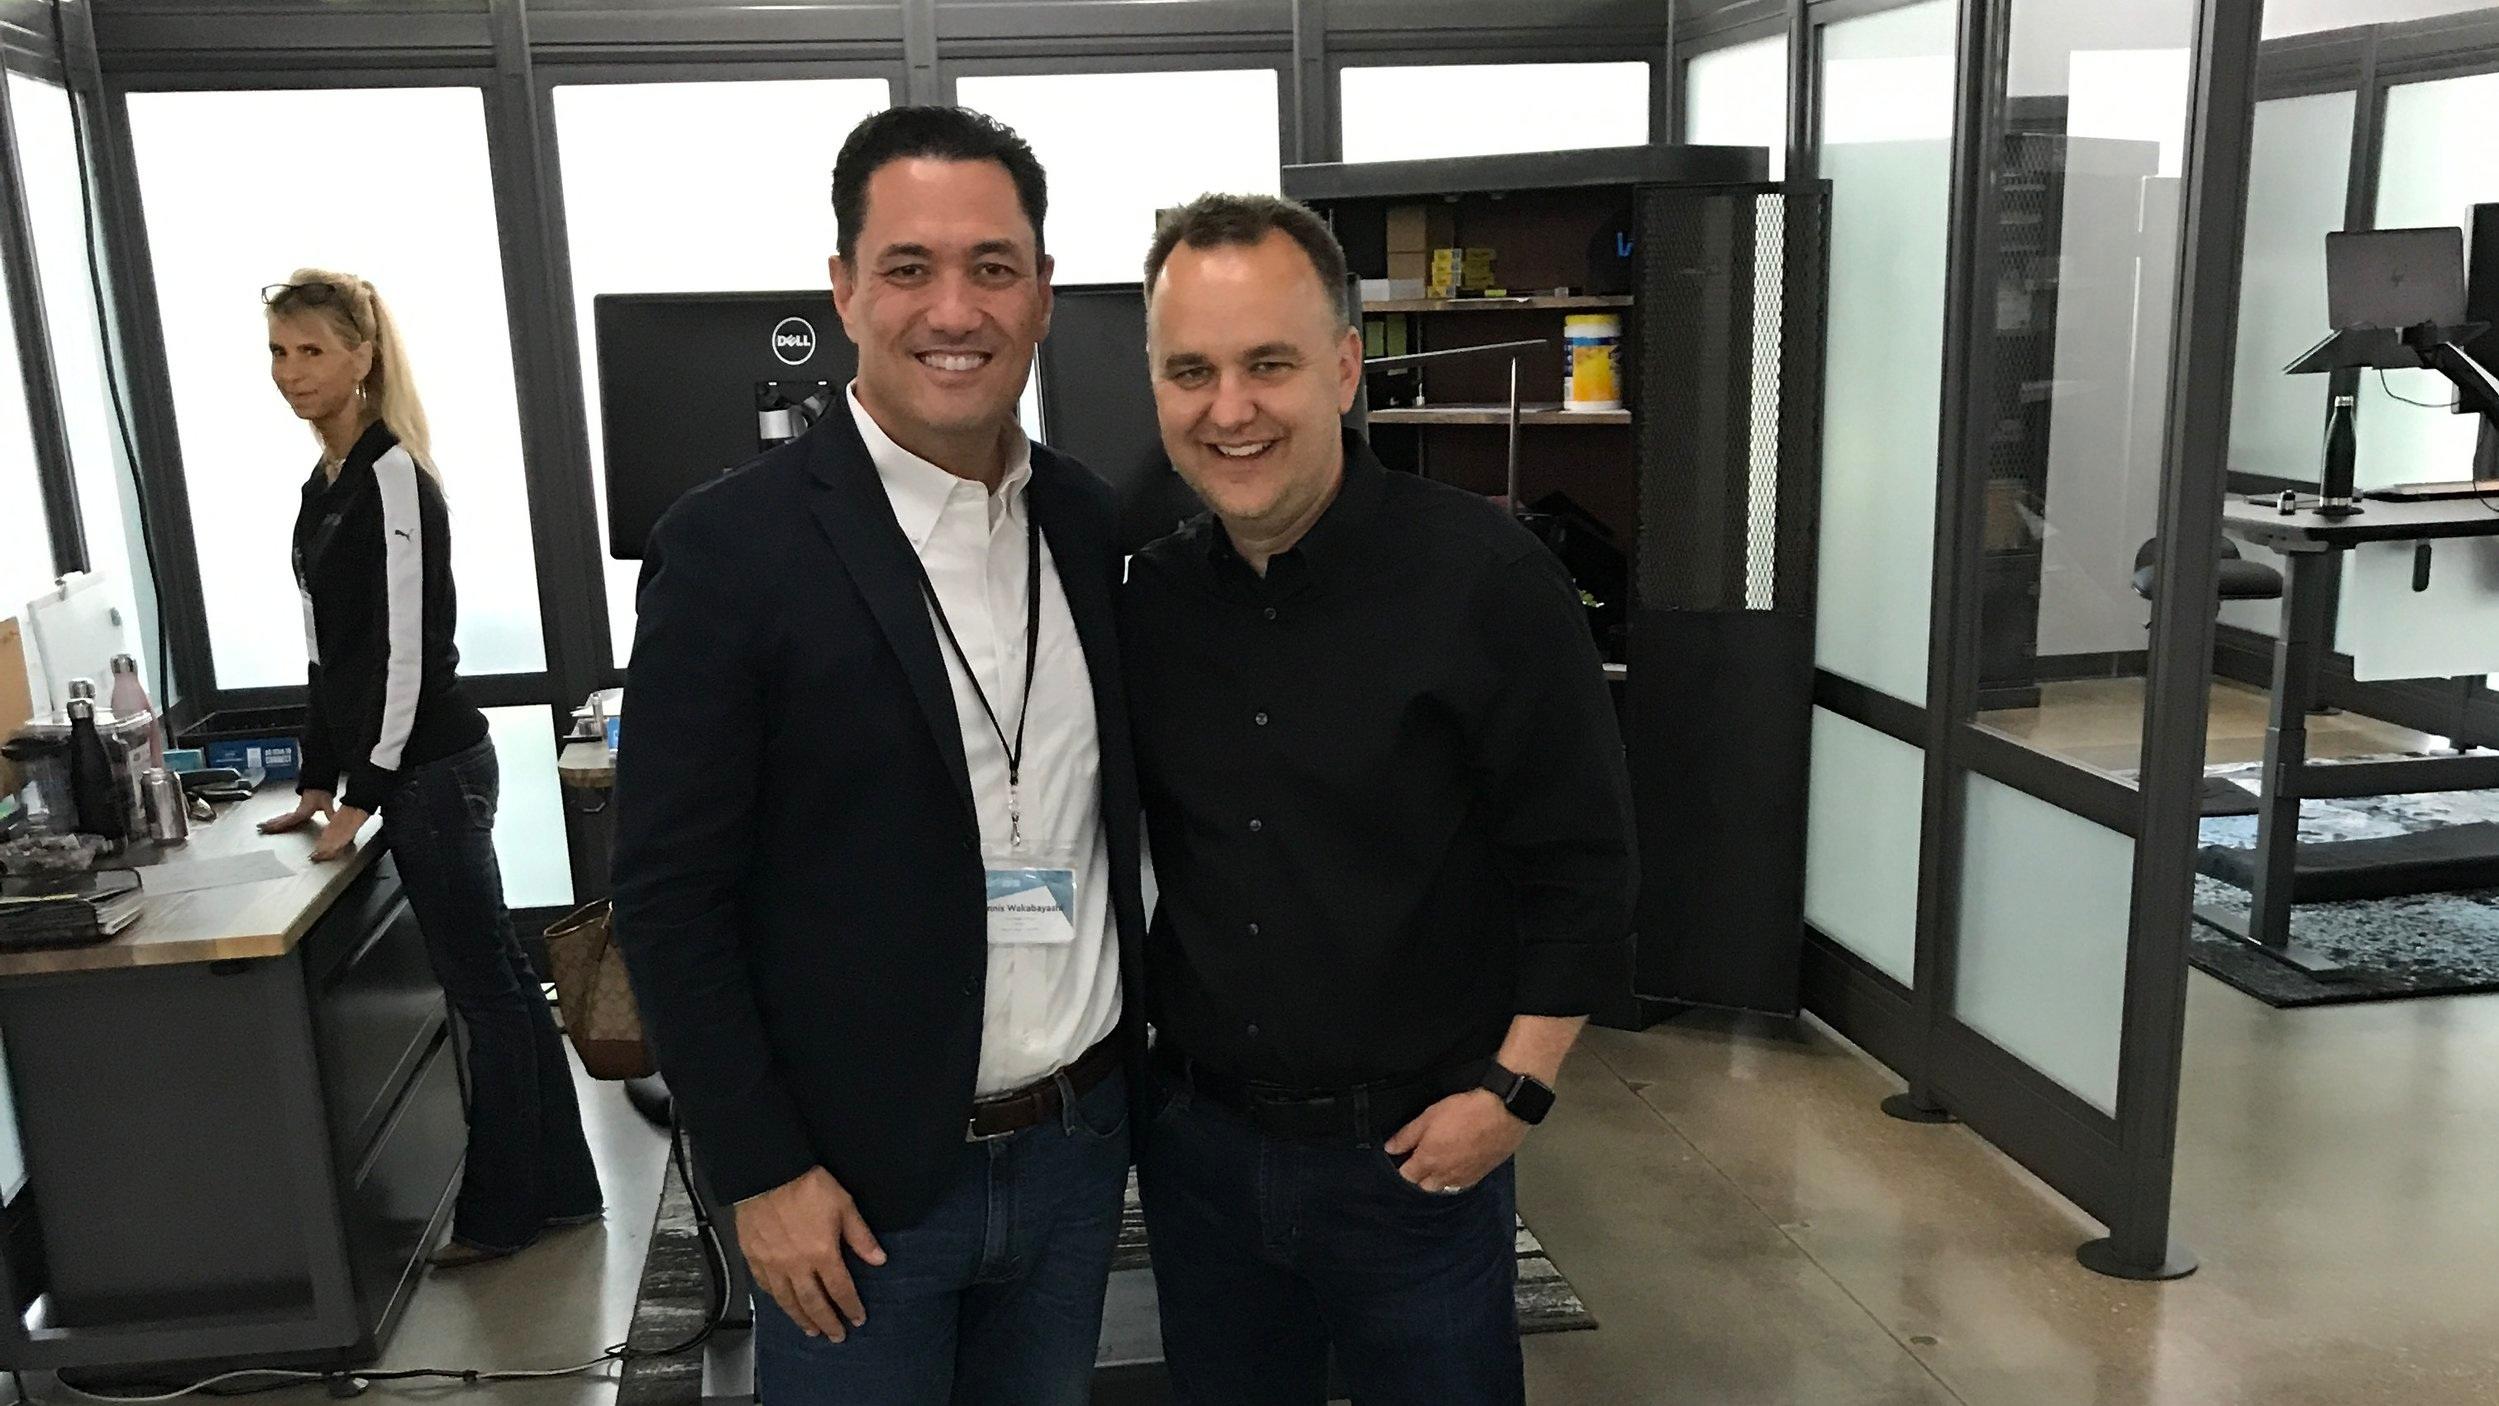 Dennis Wakabayashi on the left and CEO of VARIDESK Jason McCann on the right.